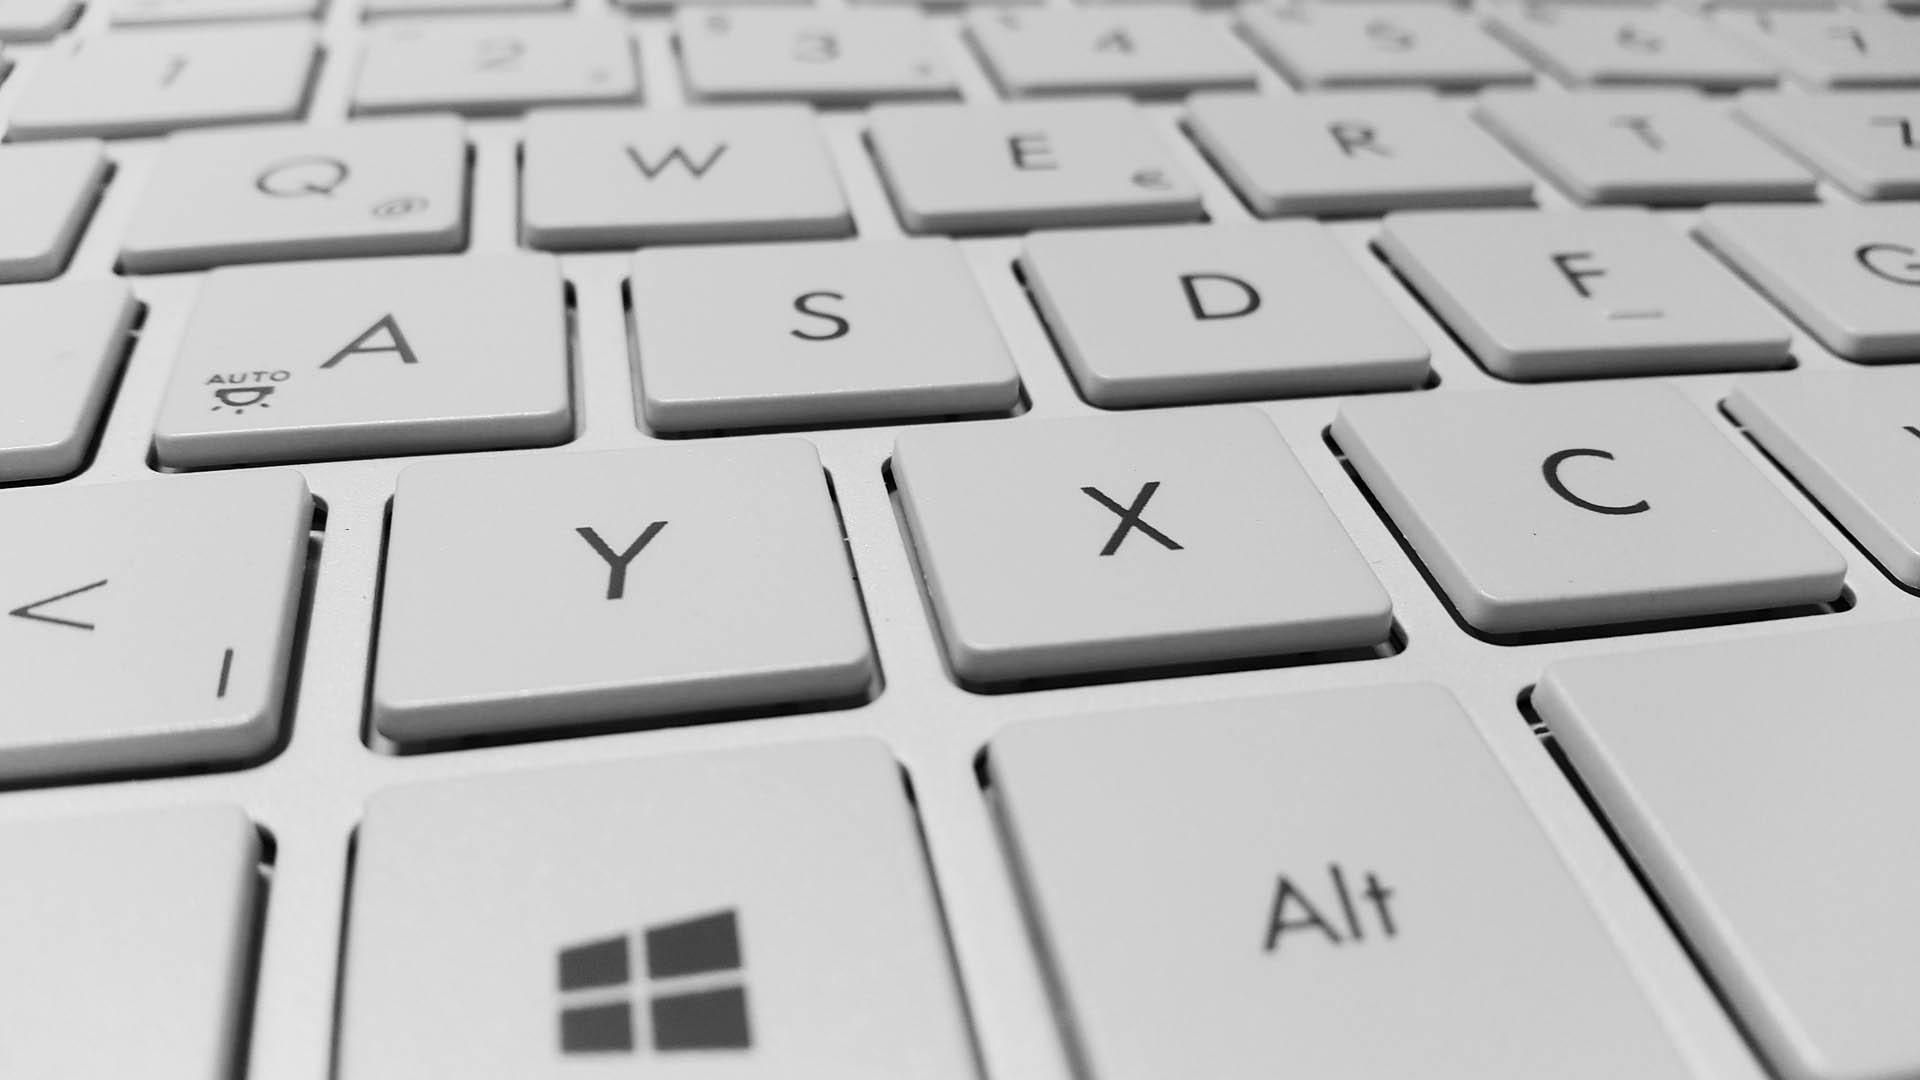 Tastatur in Perspektive